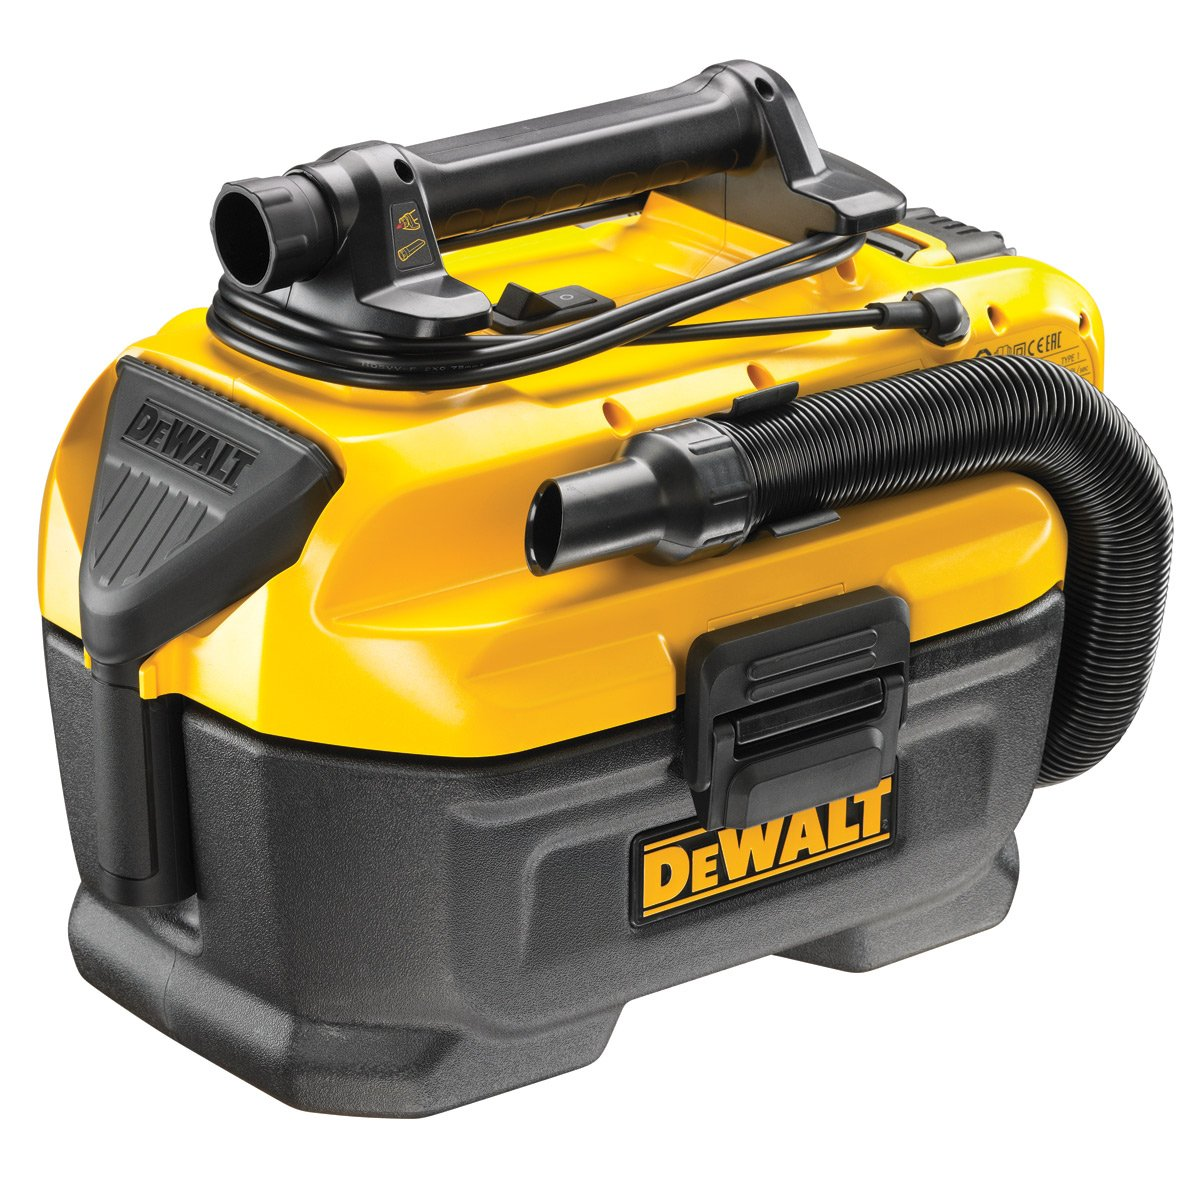 DeWalt DCV582-GB - 14,4 / 18V Inalámbrico/Con Cable Xr Wet/Dry ...